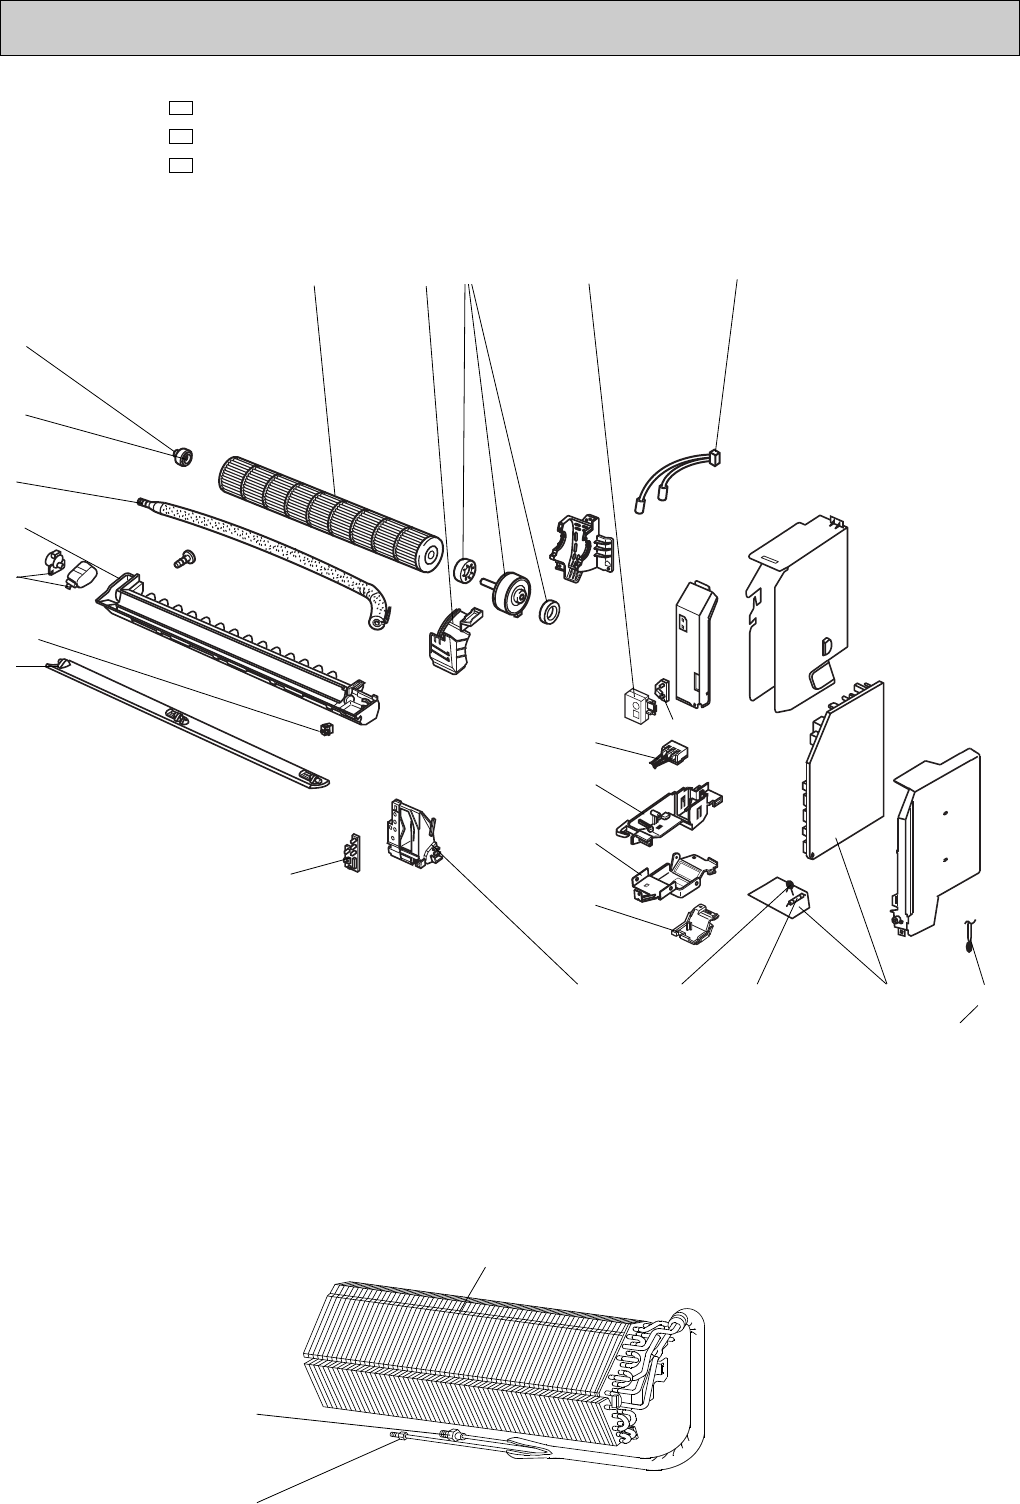 Mitsubishi Electronics MSZ-GA22VA, MSZ-GA25VA, MSZ-GA35VA